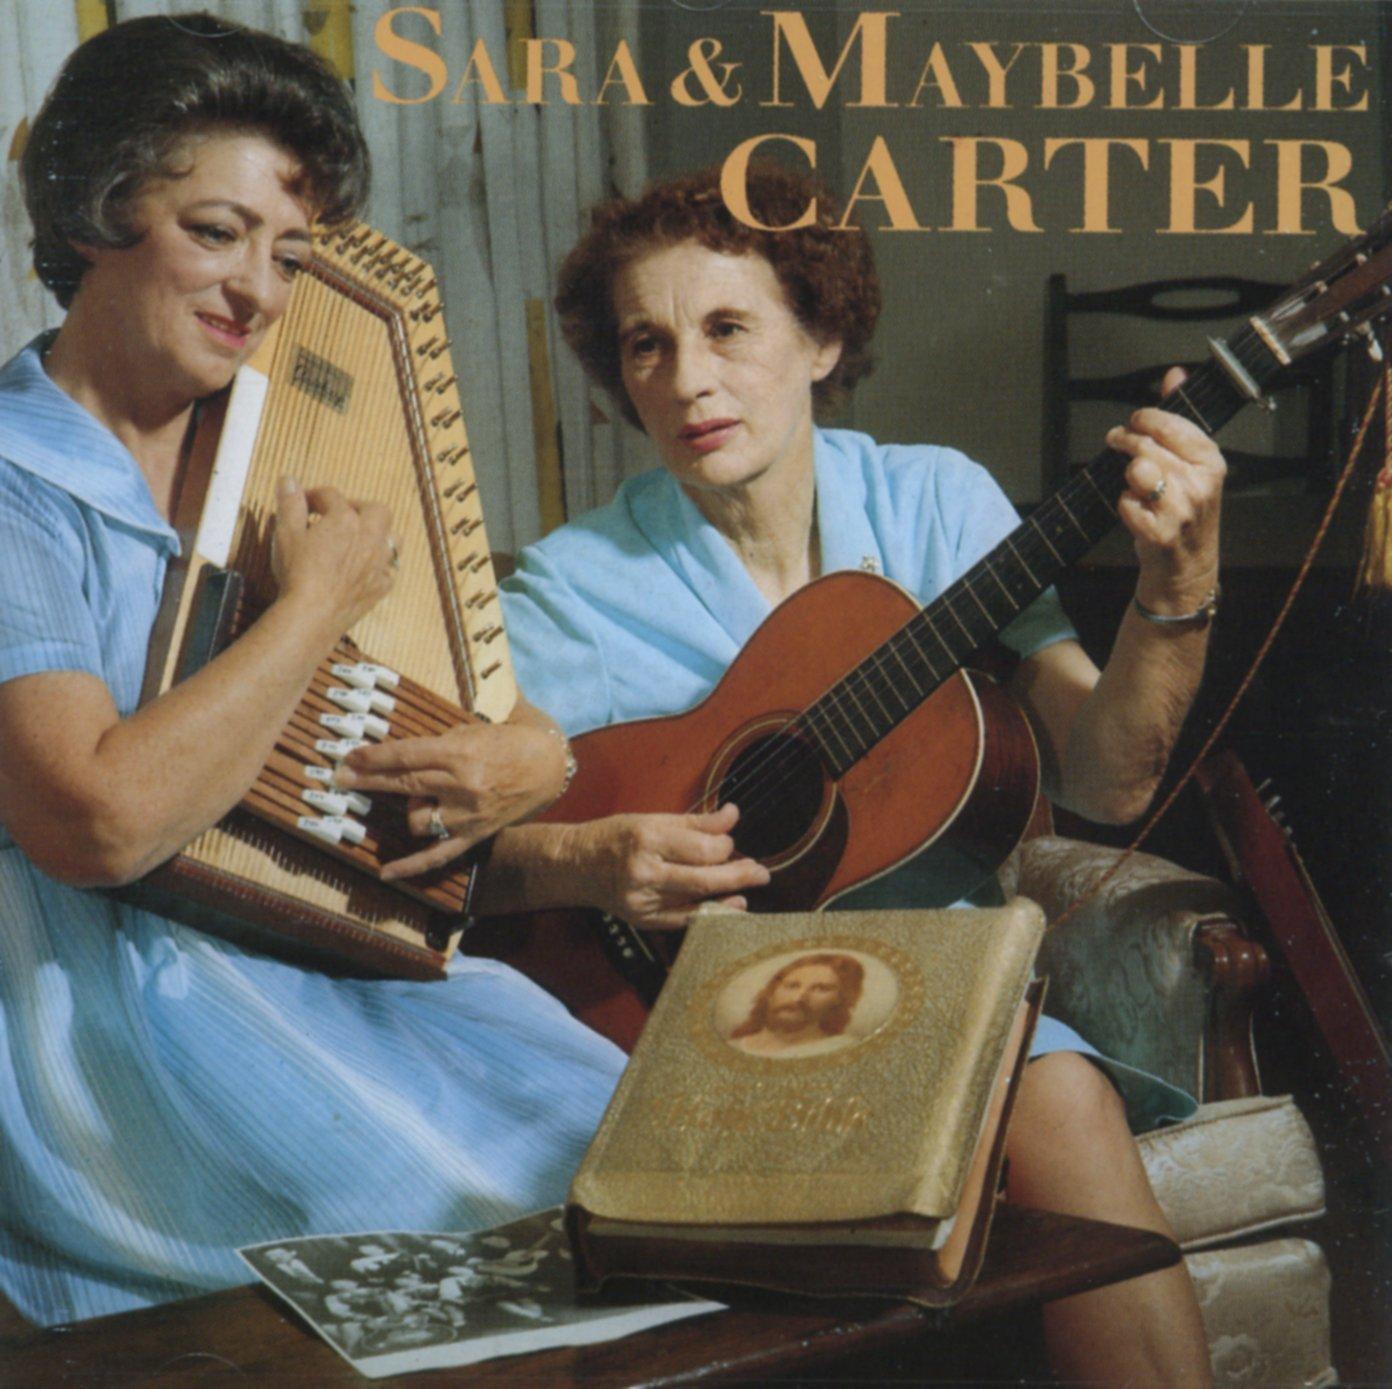 tinhte-Maybelle-Carter-playlist-2.jpg